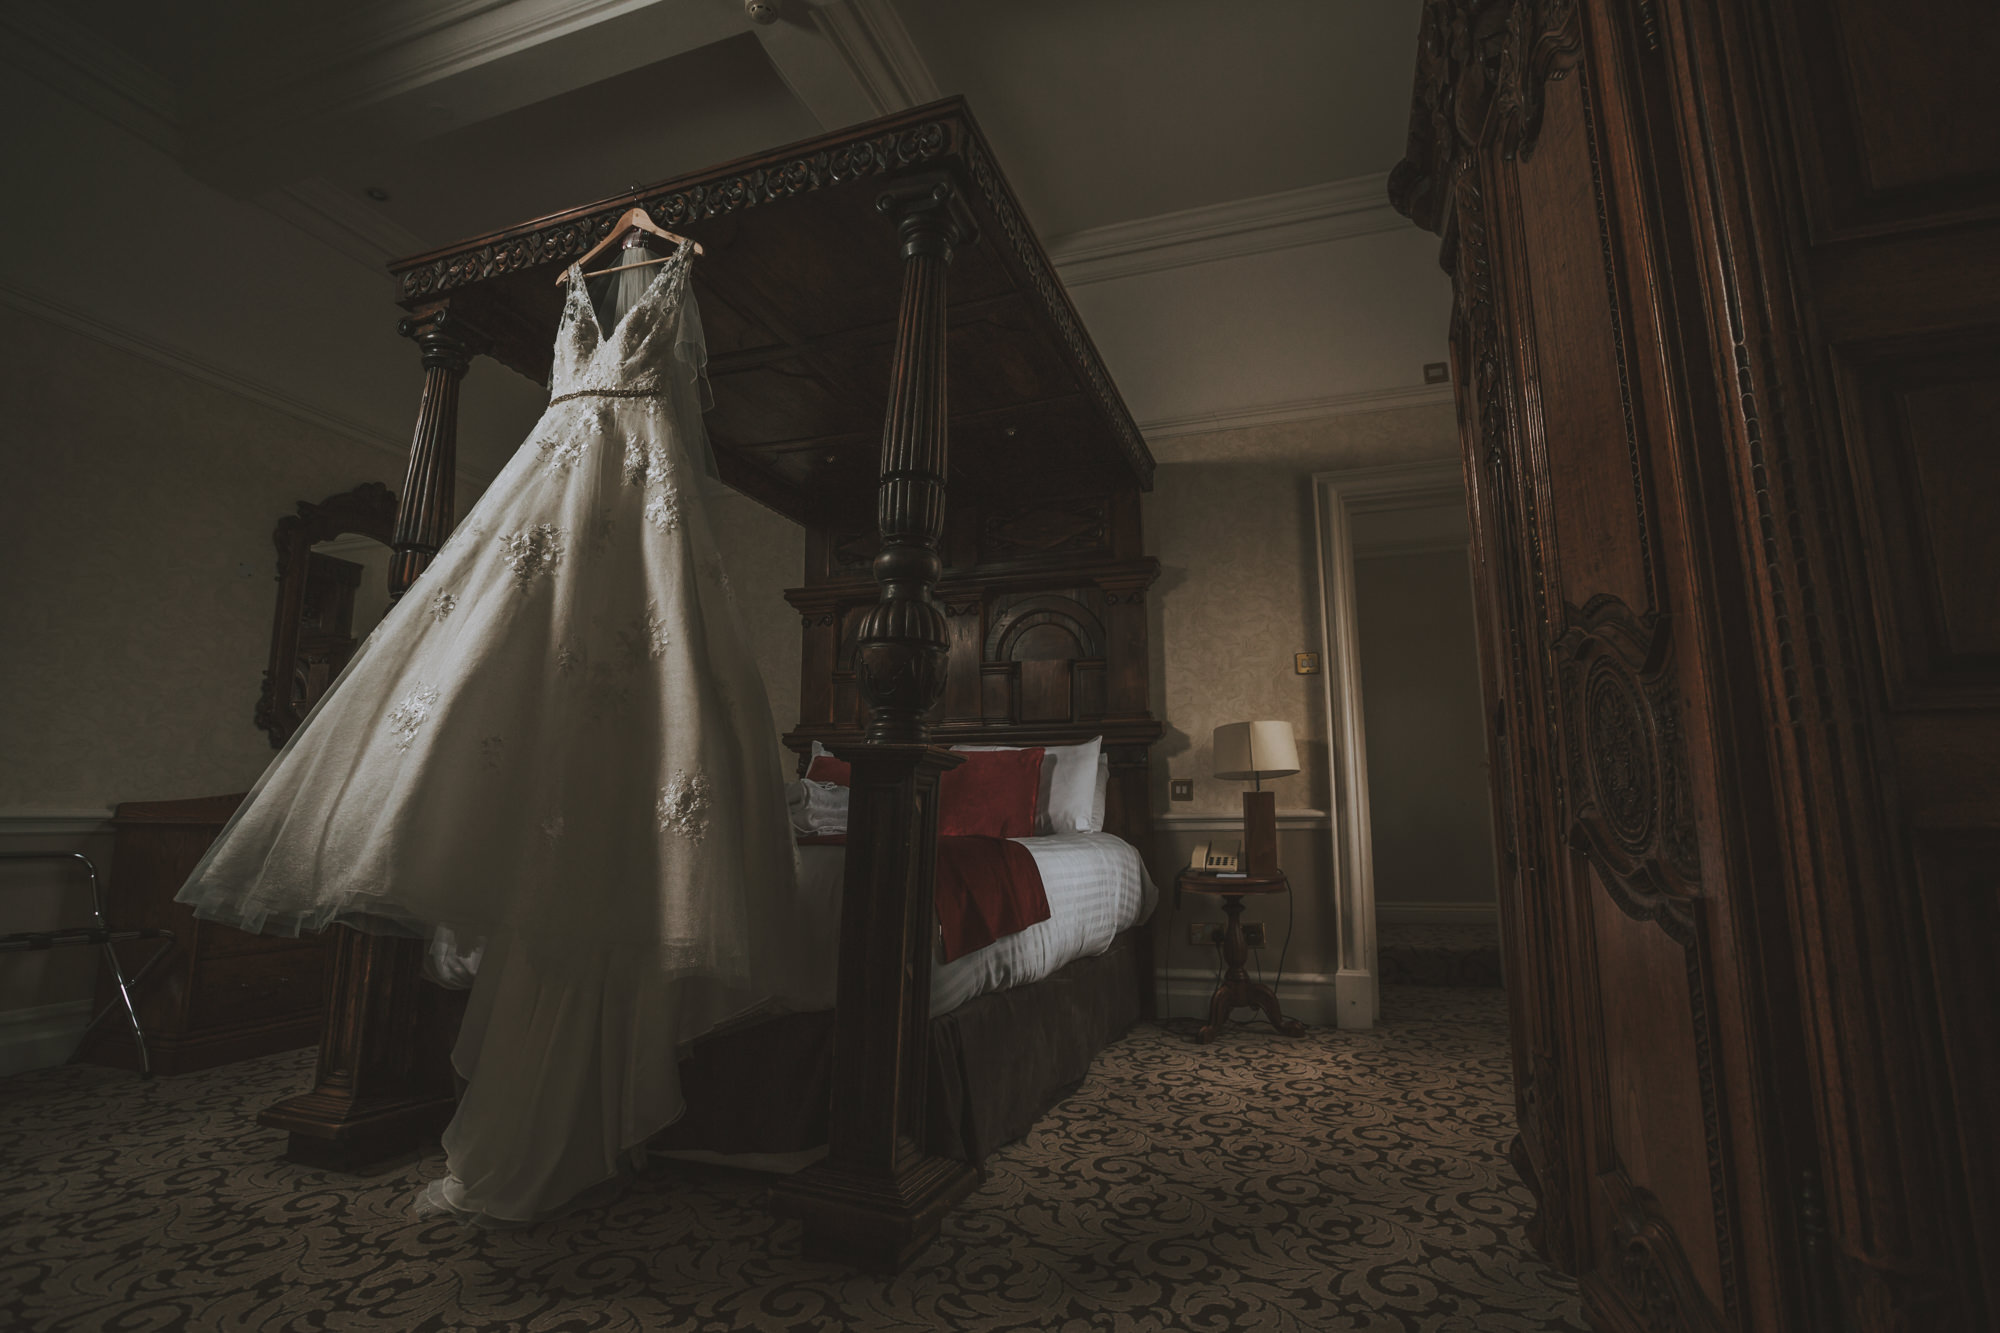 hellaby hall wedding photographers in rotherham, yorkshire-4.jpg